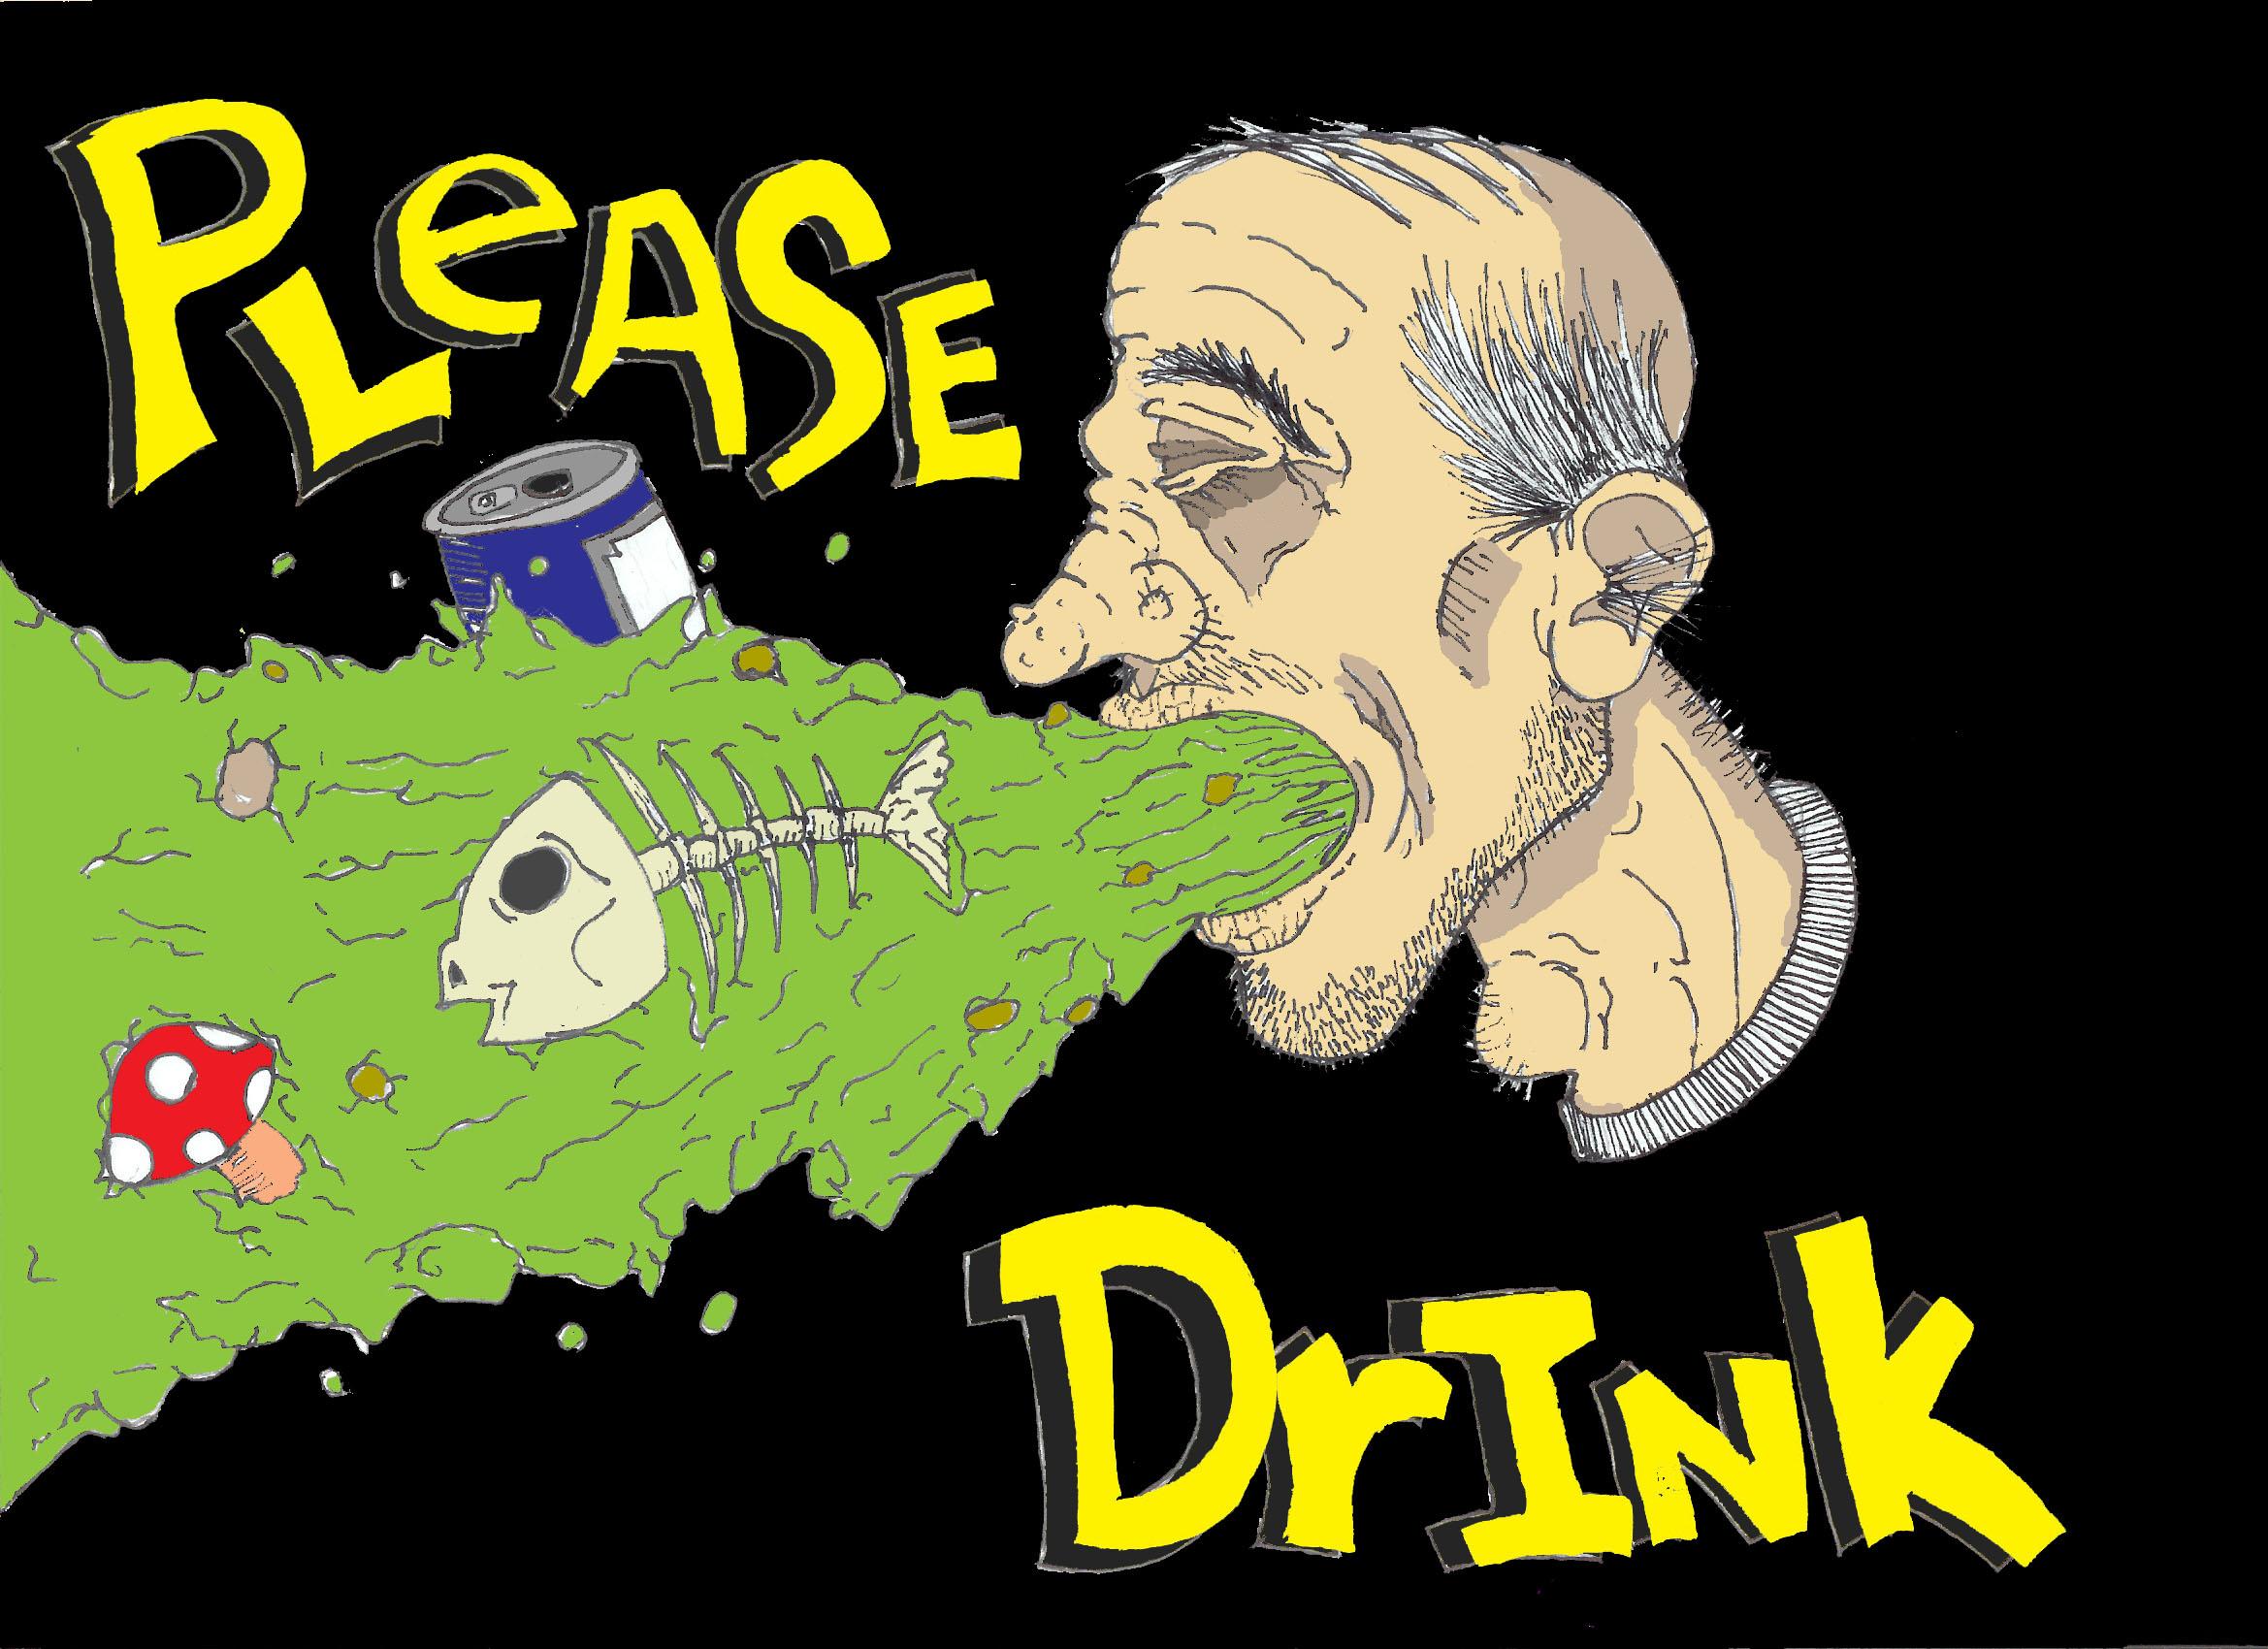 please drink?